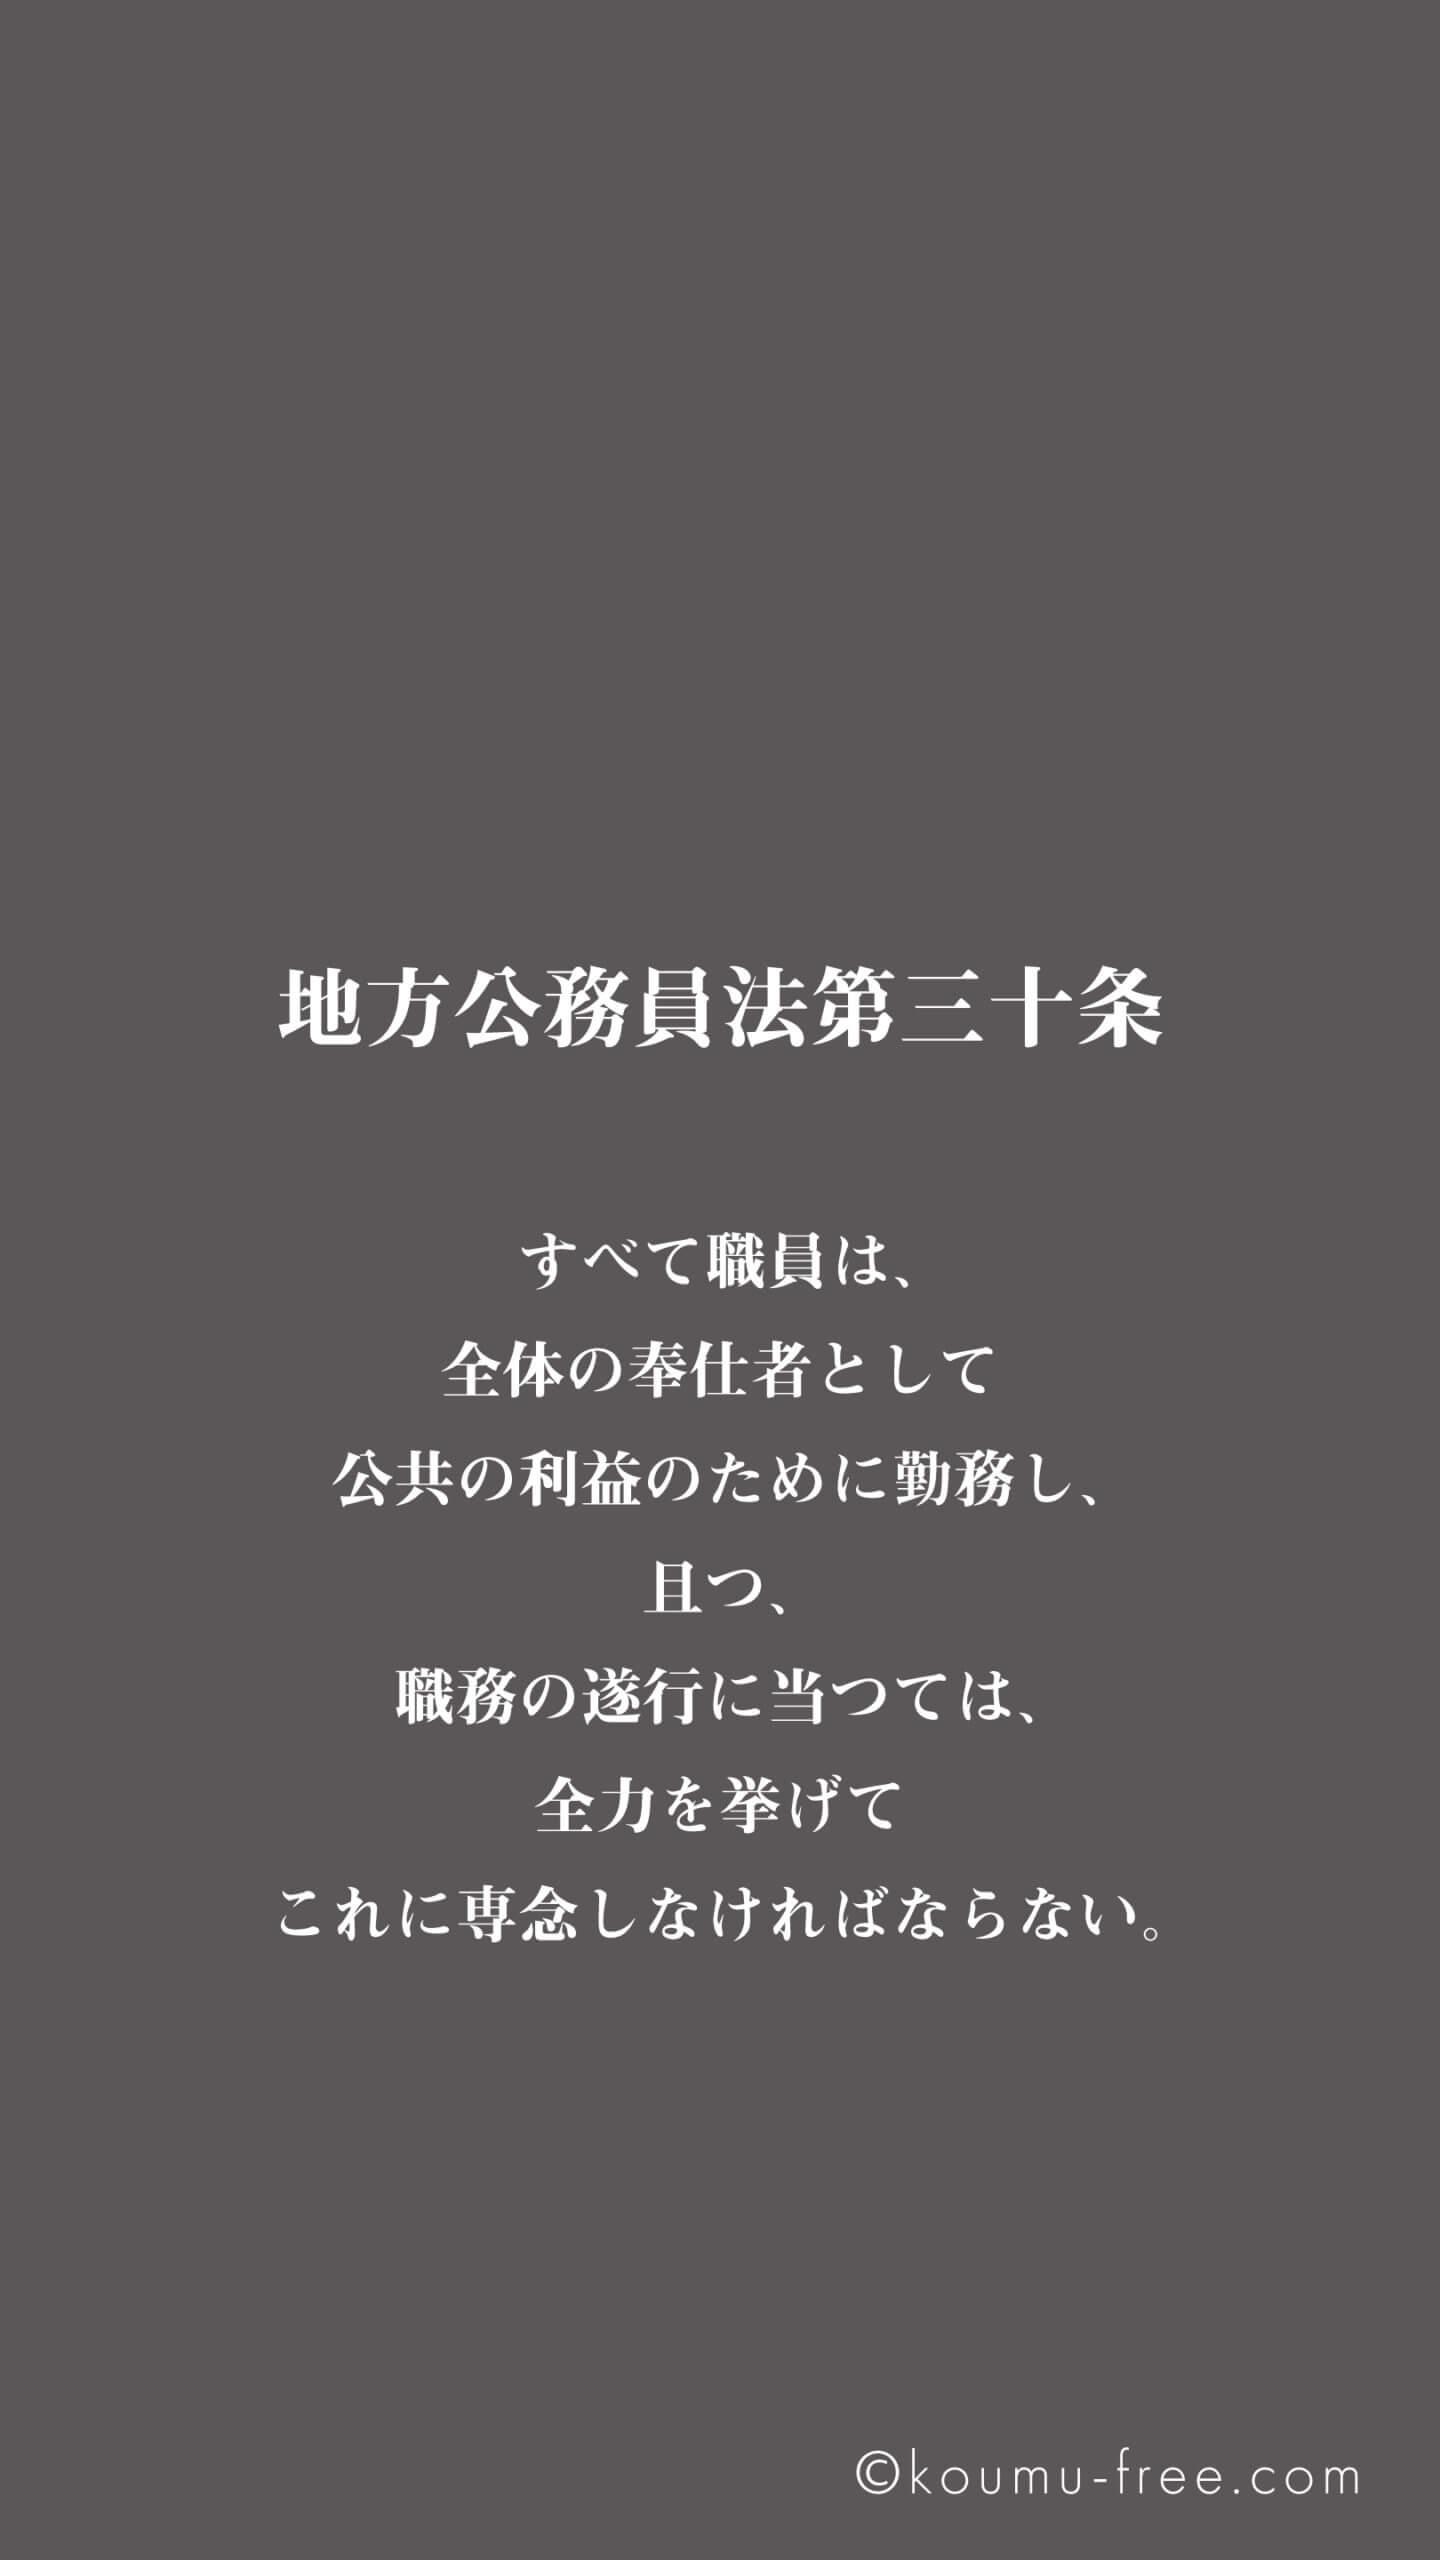 公務員壁紙・待ち受け画像(地方公務員法)